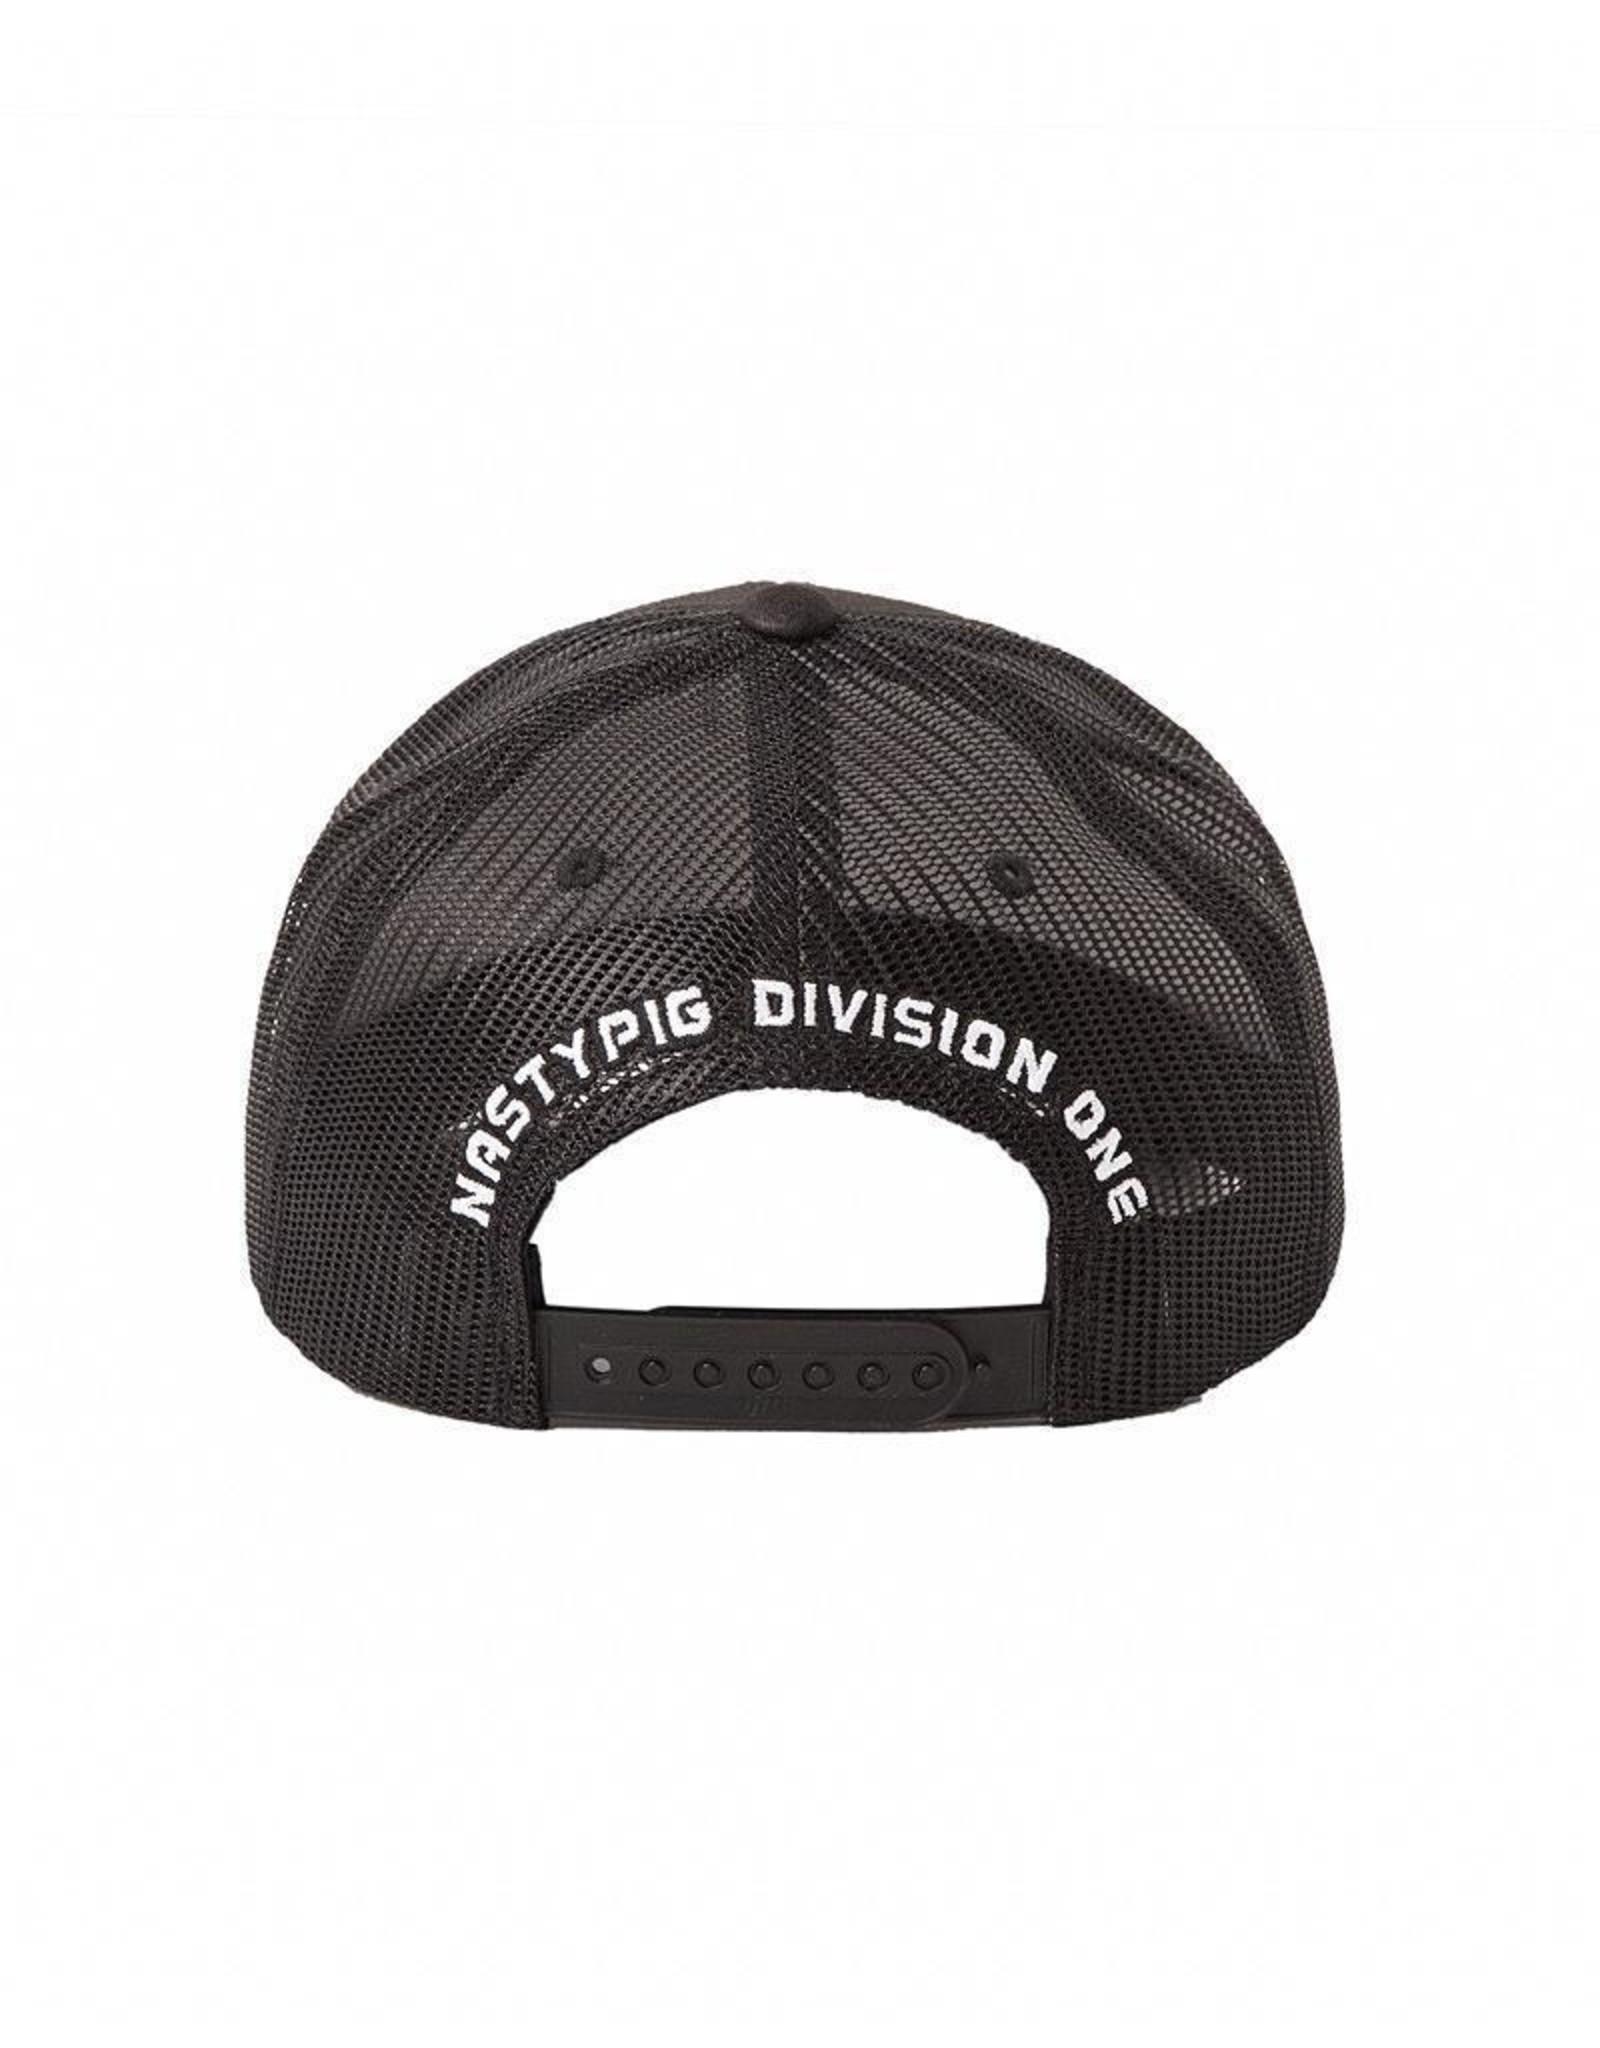 Nasty Pig Nasty Pig Racing Division Cap